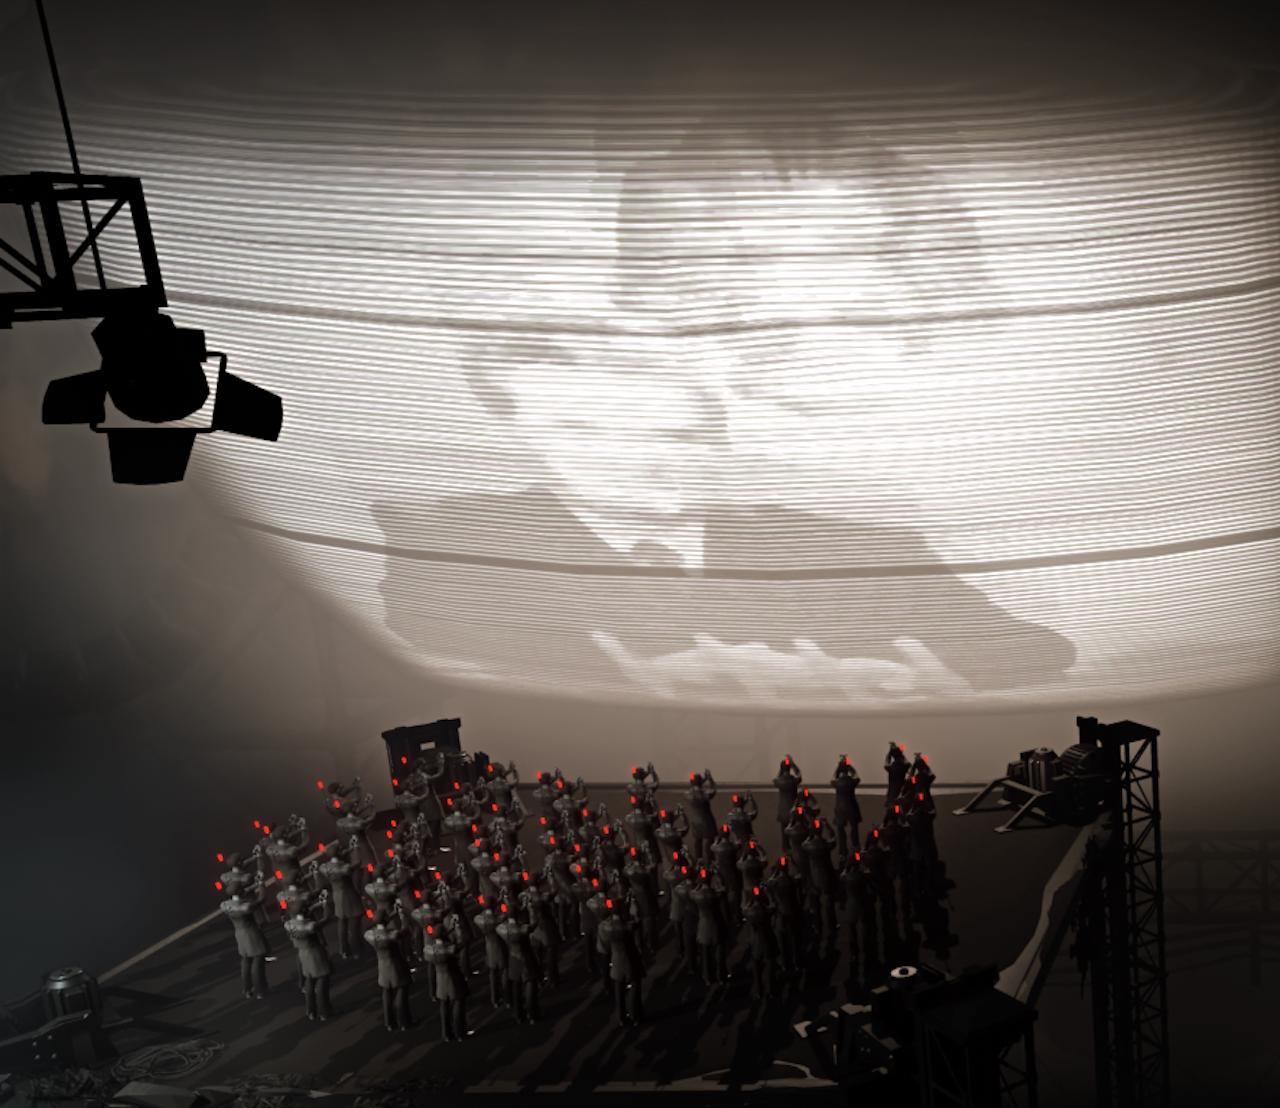 Screencap from Black the Fall.